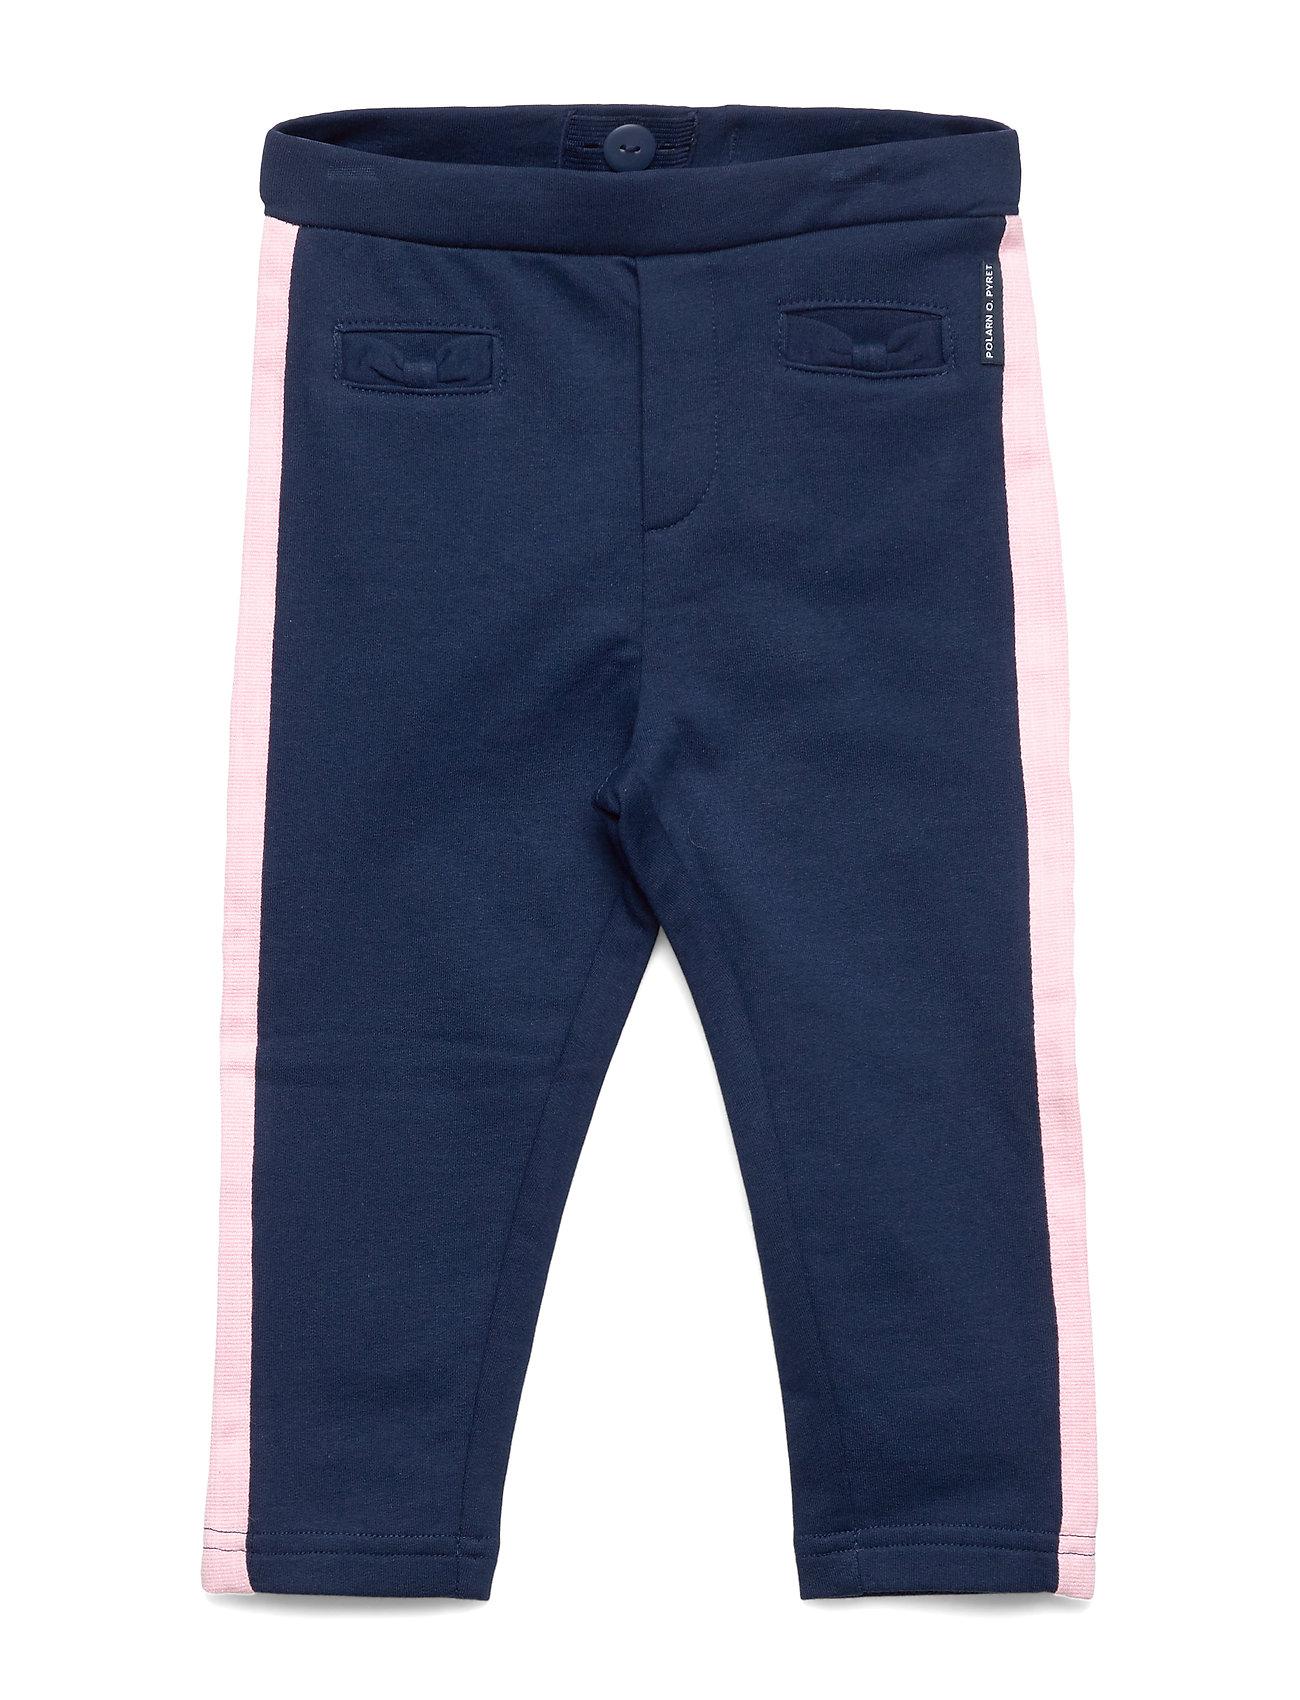 Polarn O. Pyret Trousers Jersey Preschool - MEDIEVAL BLUE